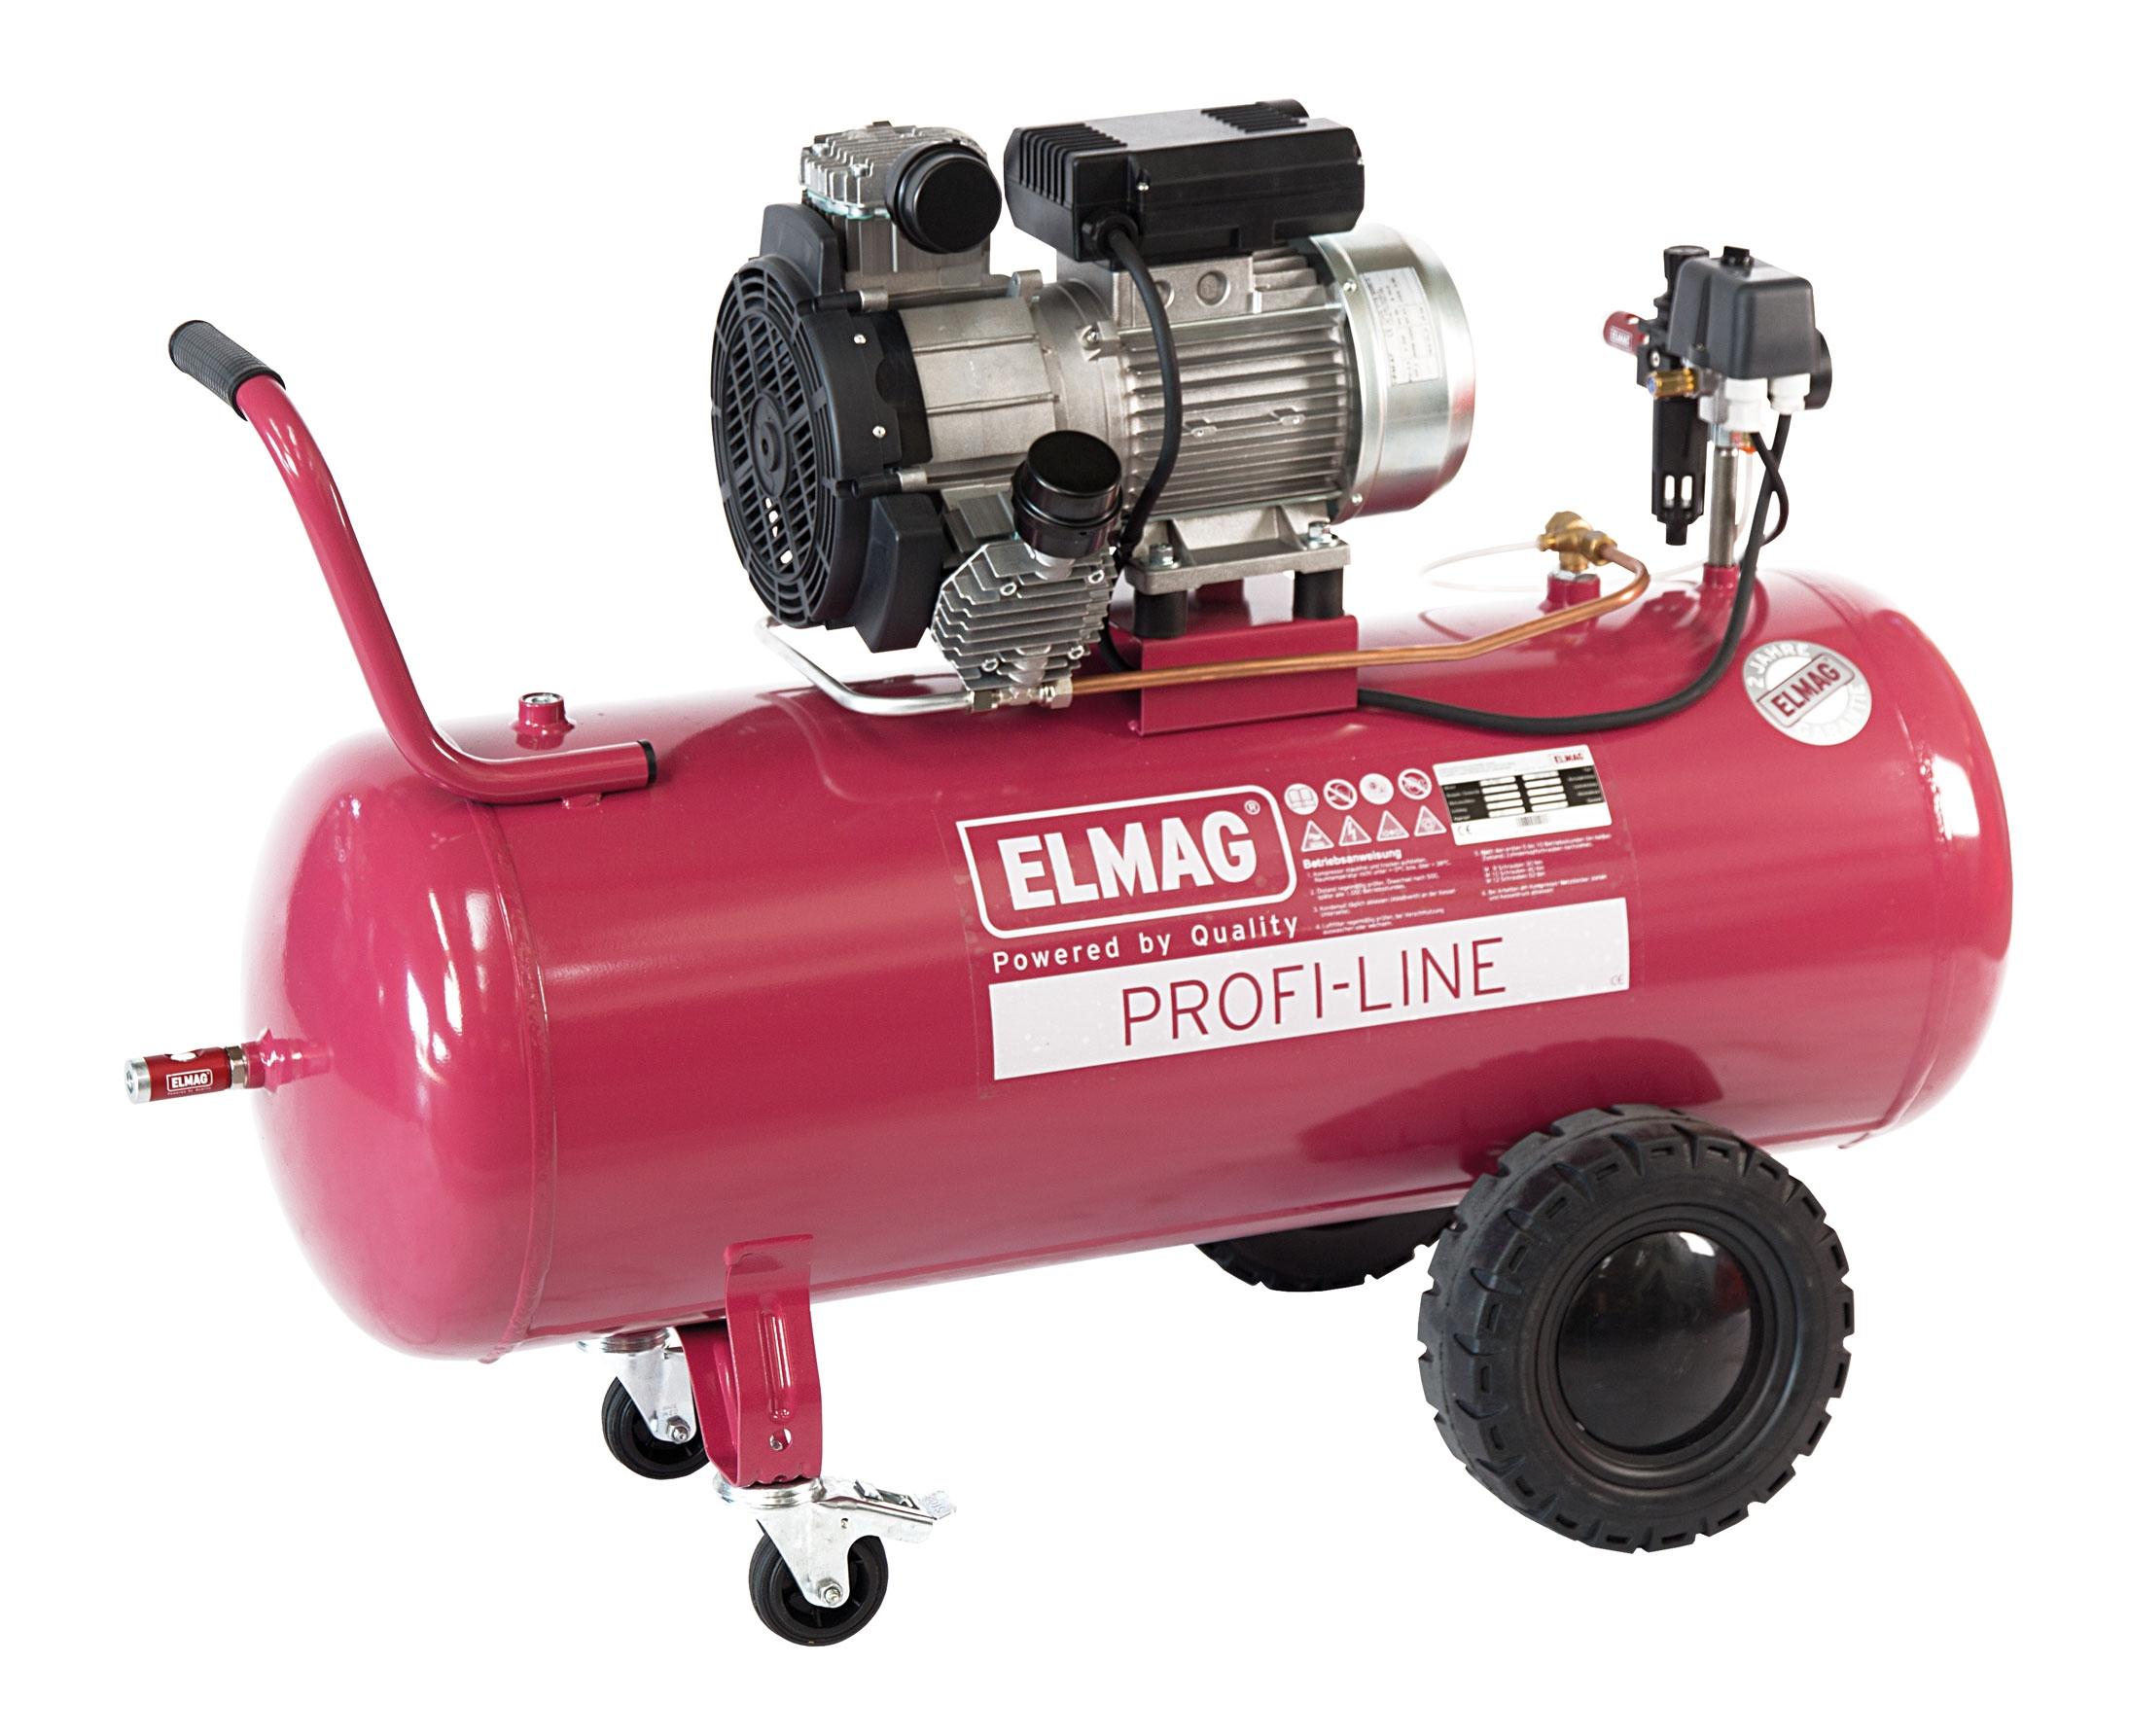 Elmag ölfreier Kompressor PROFI-LINE PL 330/10/100 W